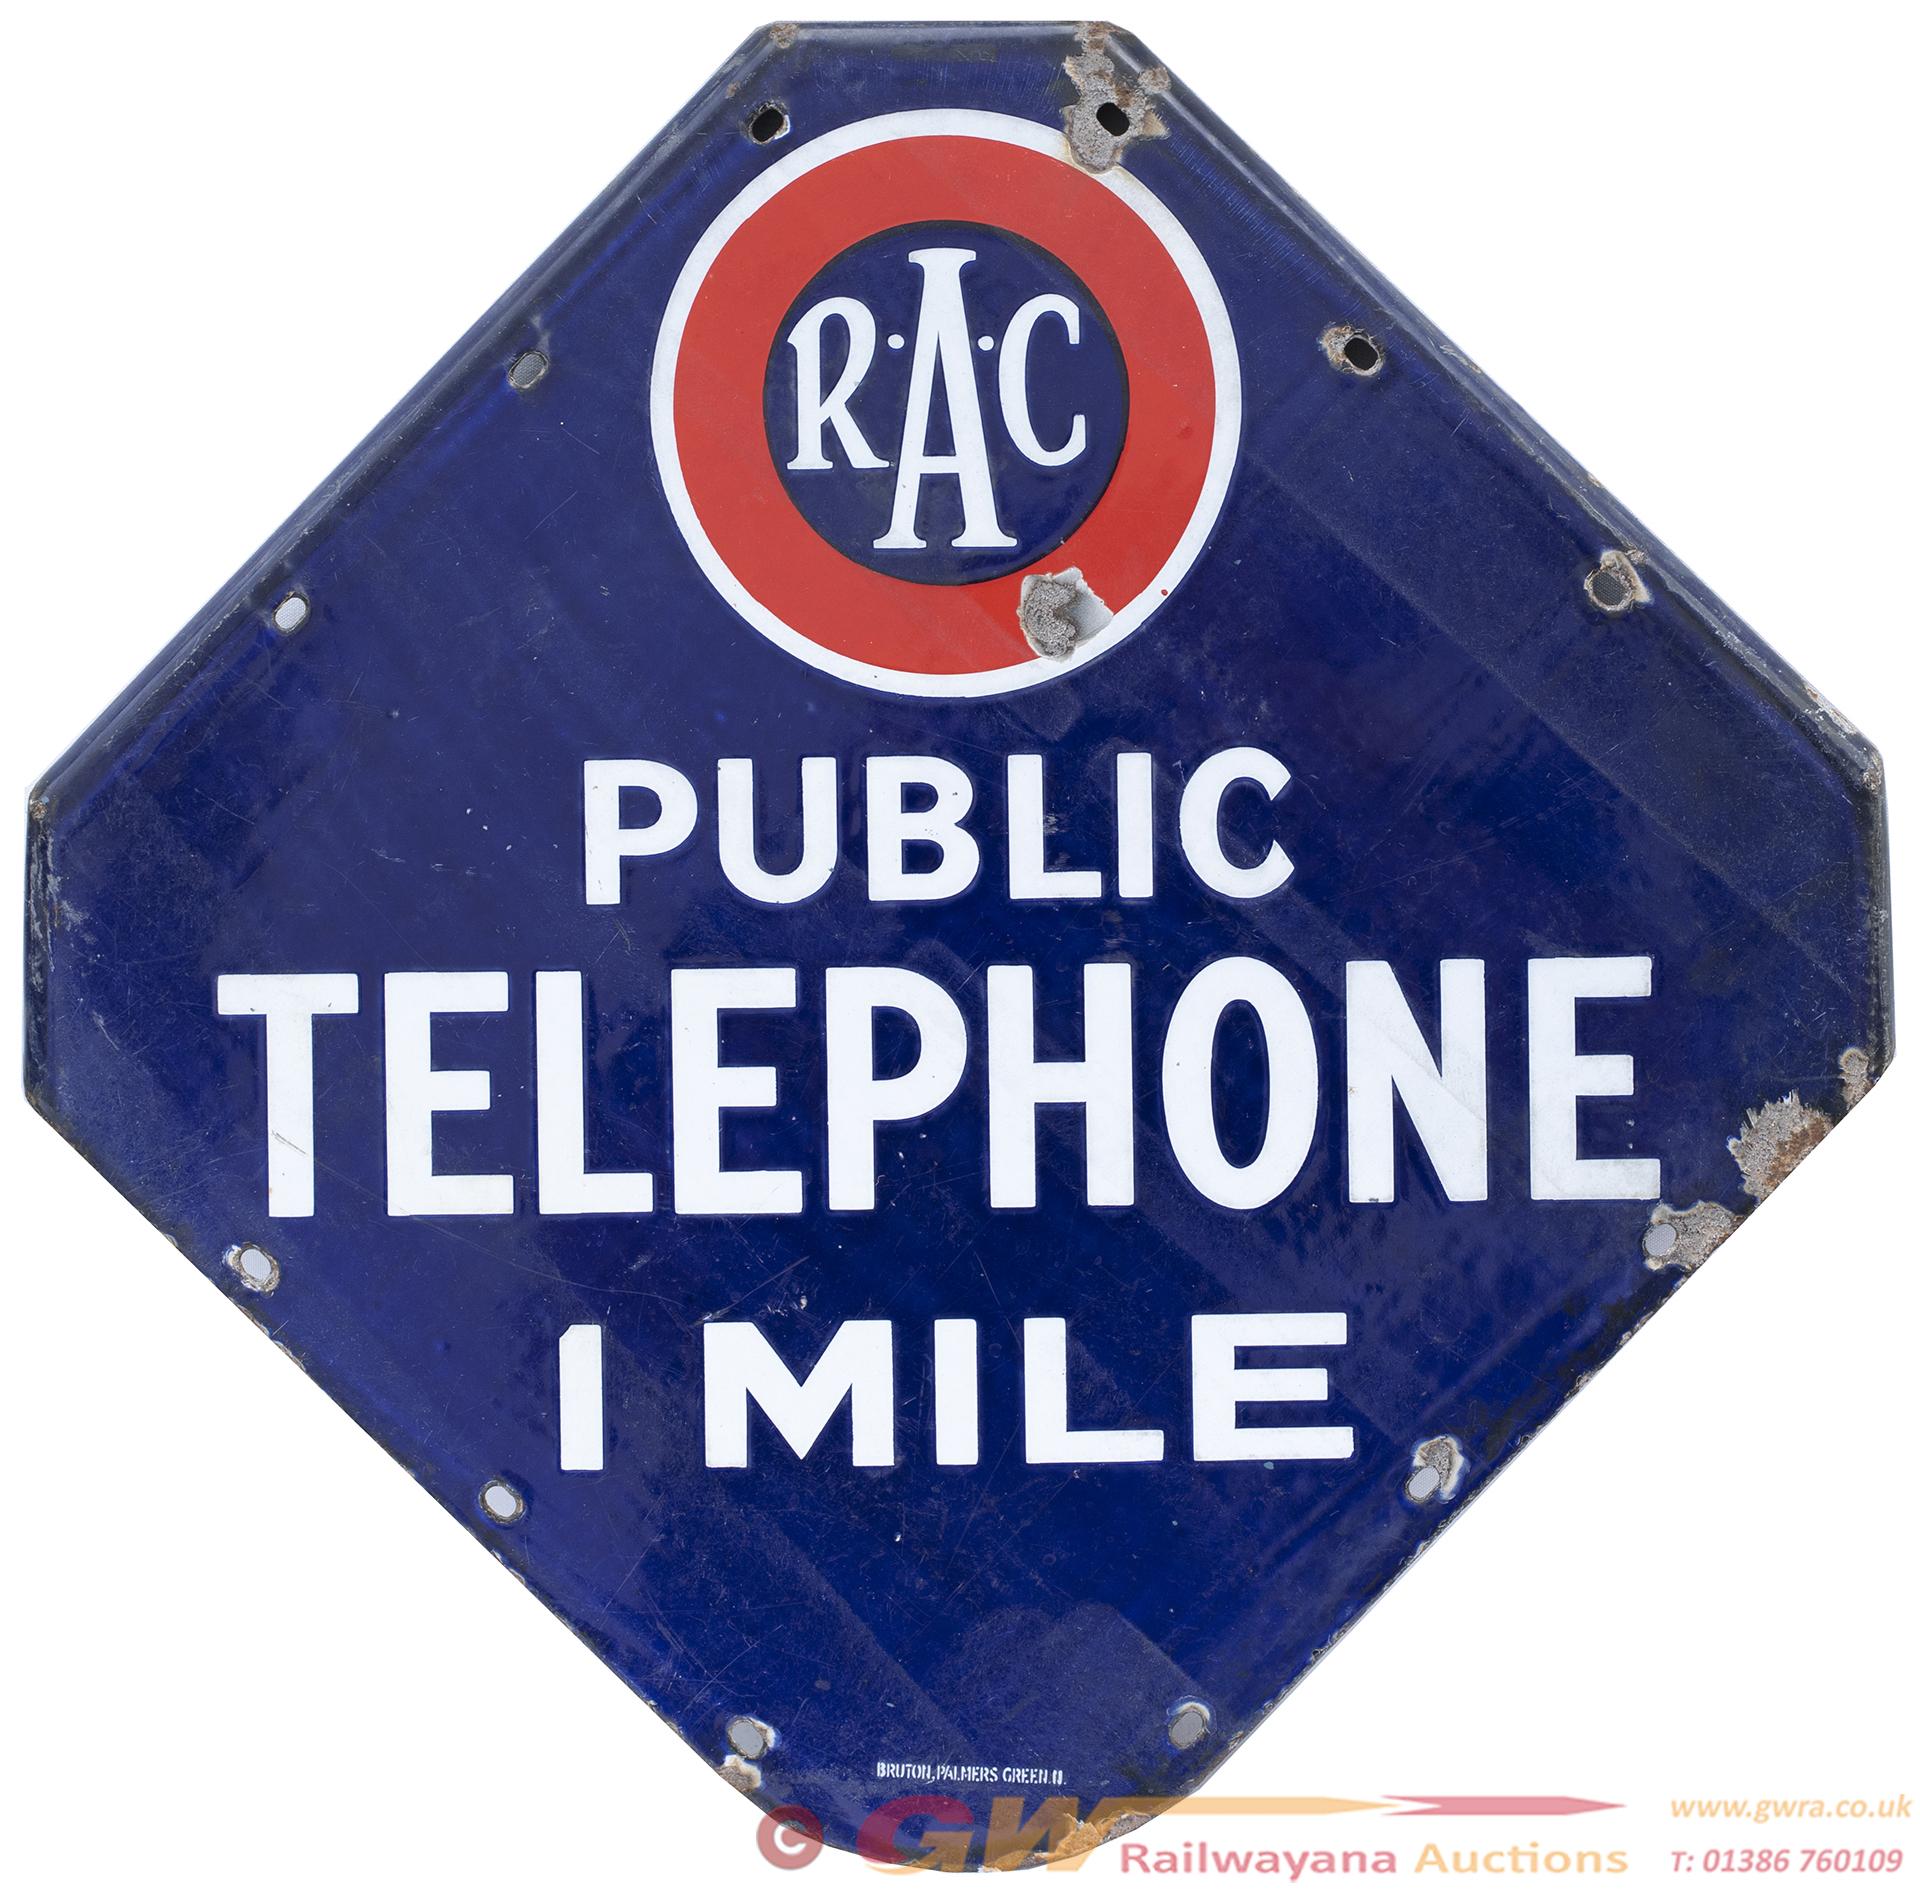 Motoring Enamel Sign RAC PUBLIC TELEPHONE 1 MILE.